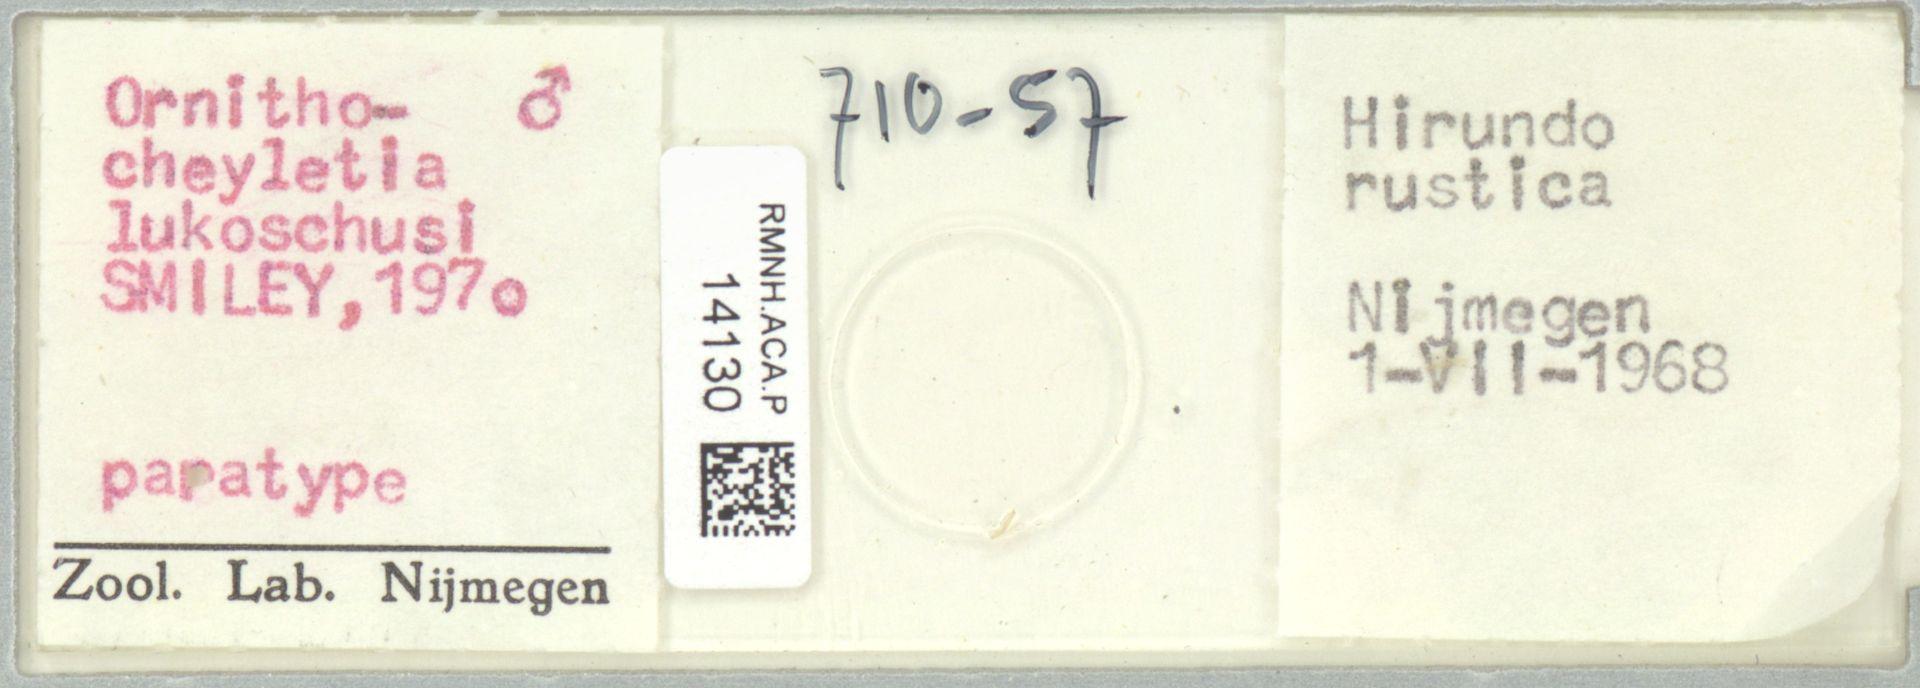 RMNH.ACA.P.14130 | Ornithocheyletia lukoschusi Smiley, 1970